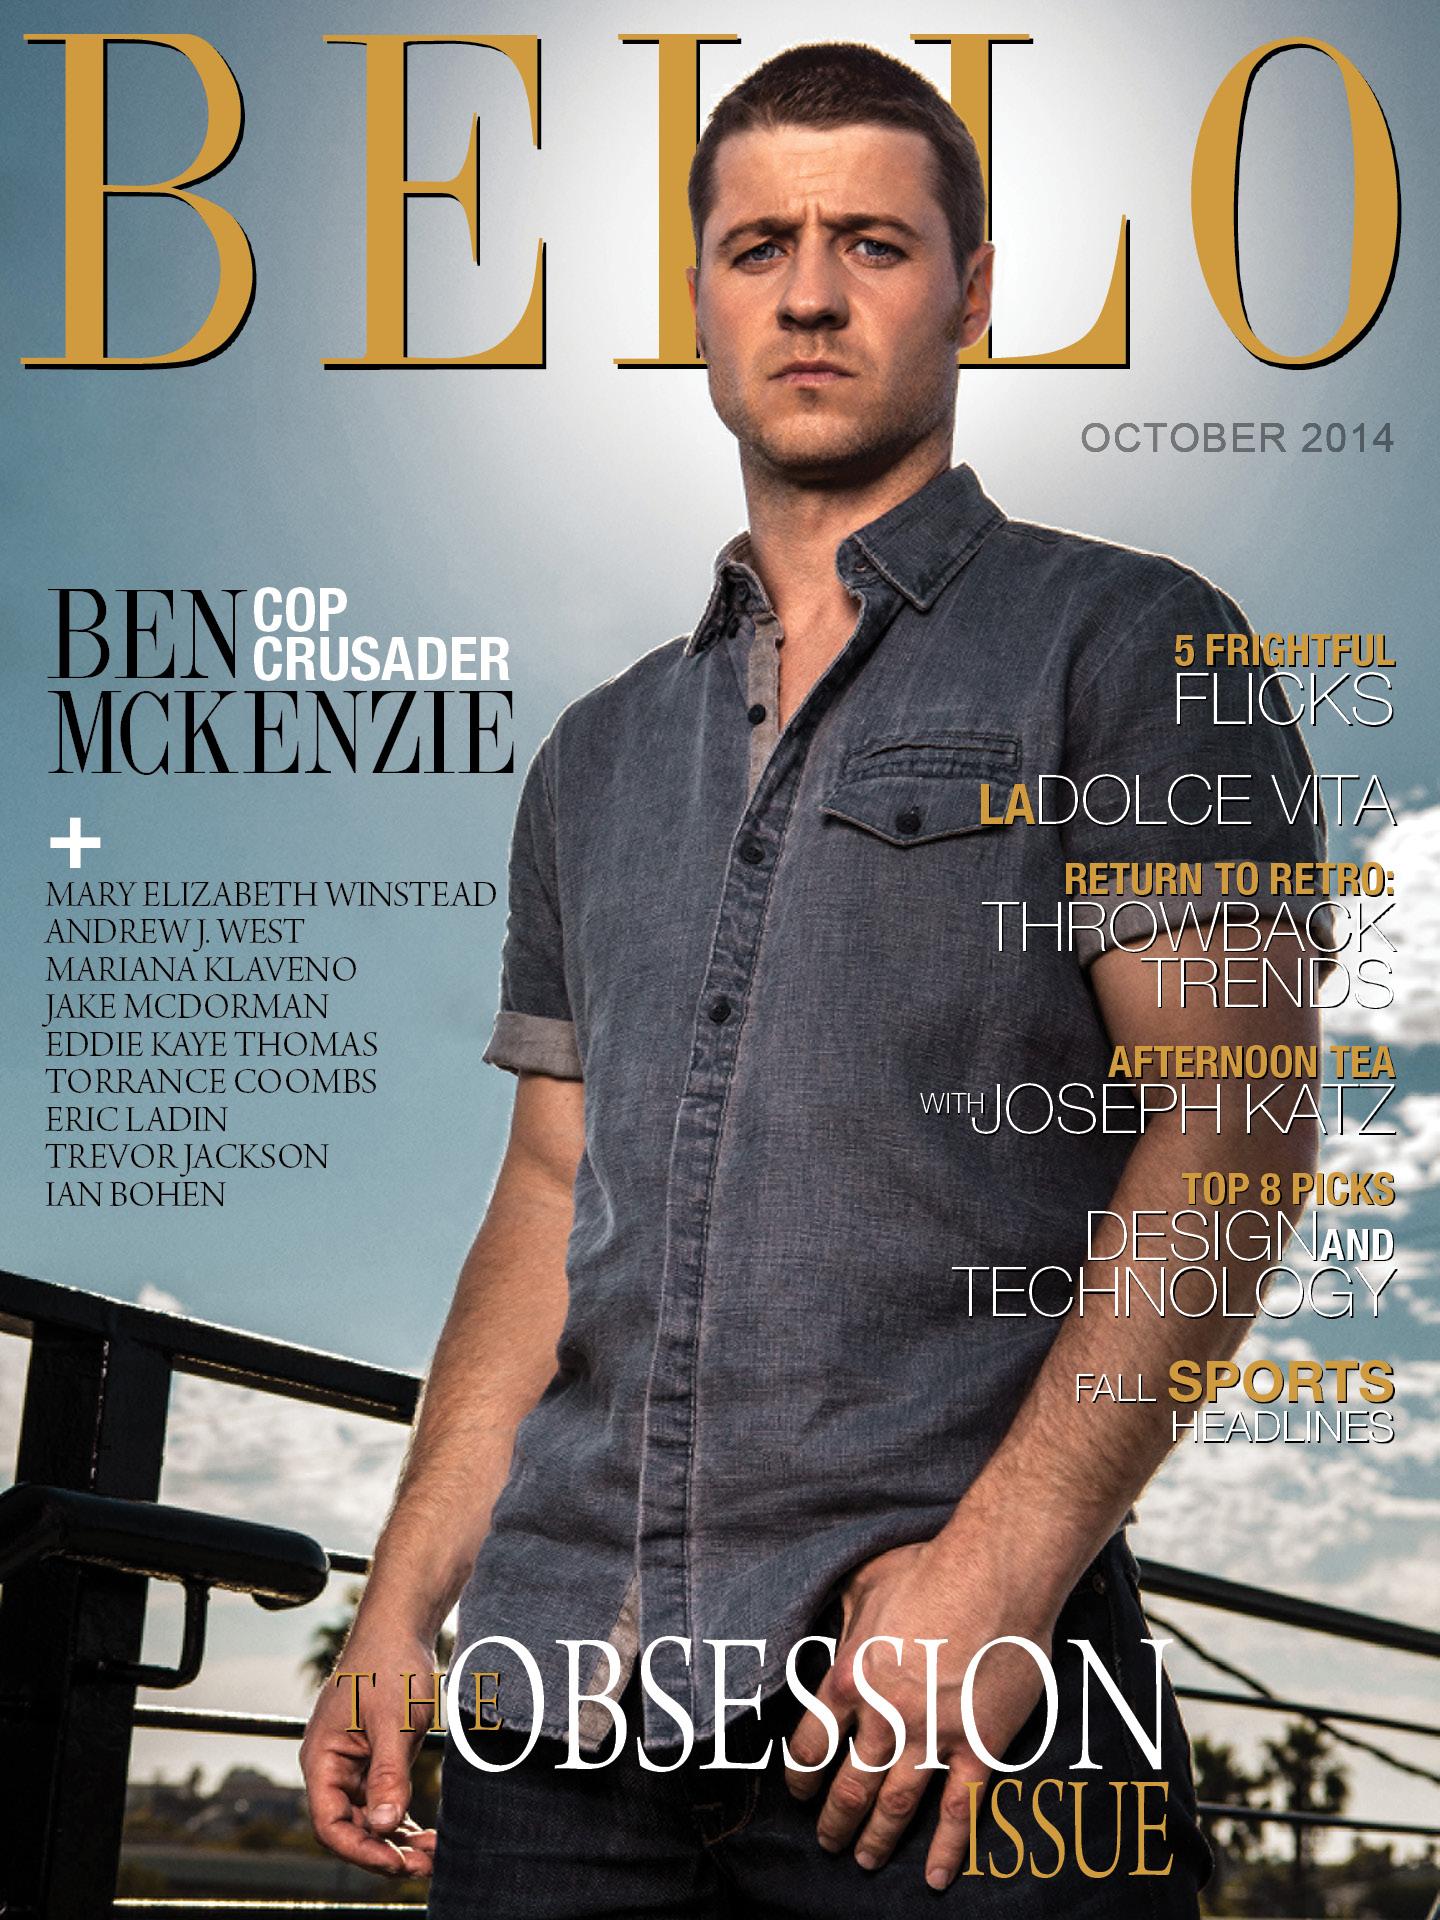 Read the Magazine